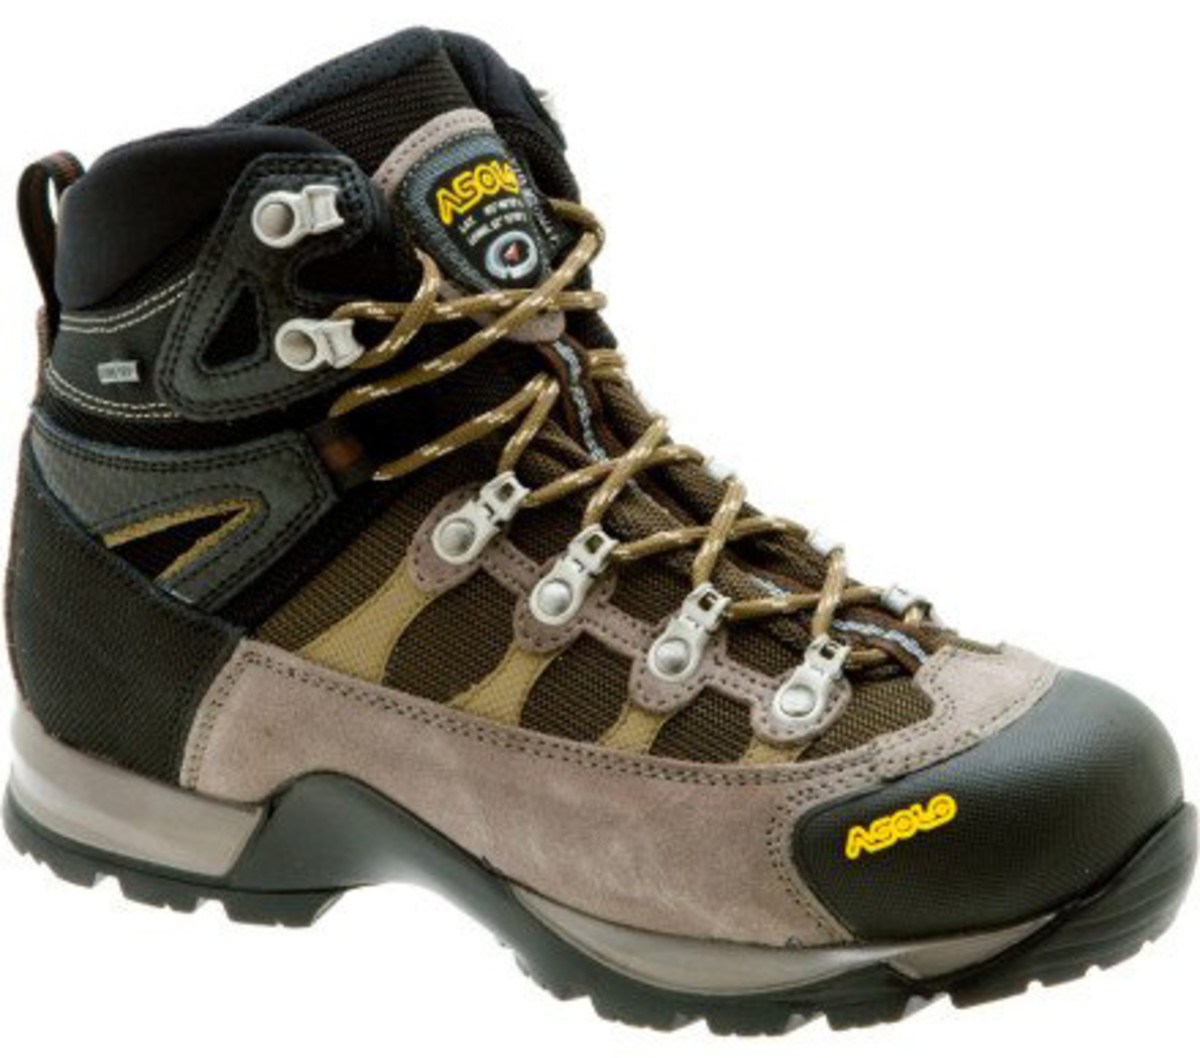 Best women's hiking boots 2016